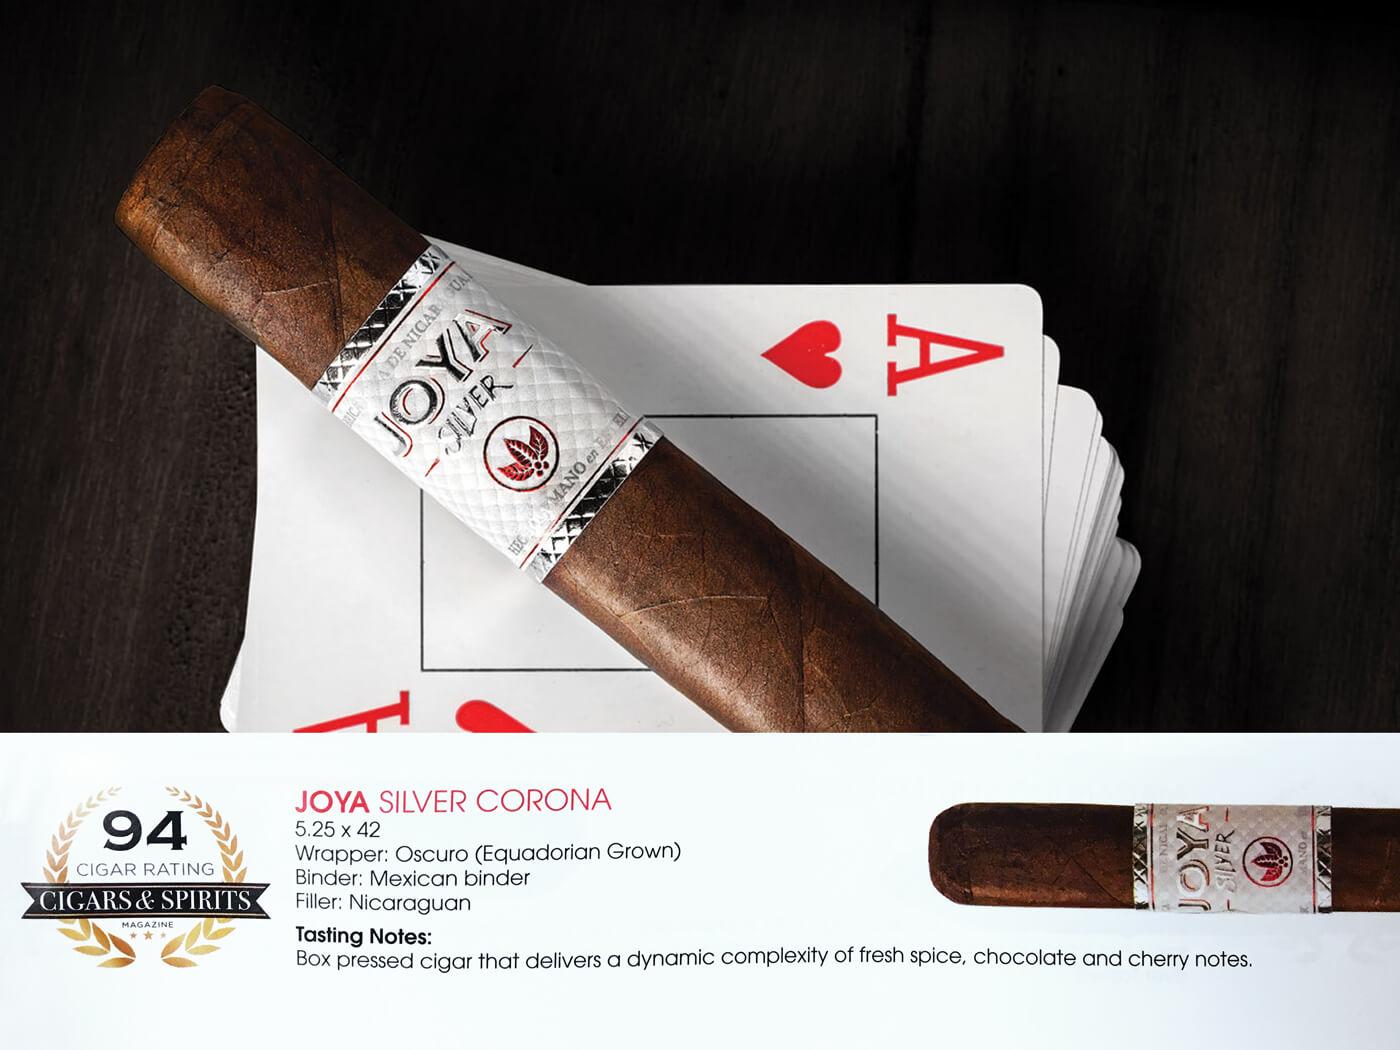 joya-silver-reviews-cigar-spirits